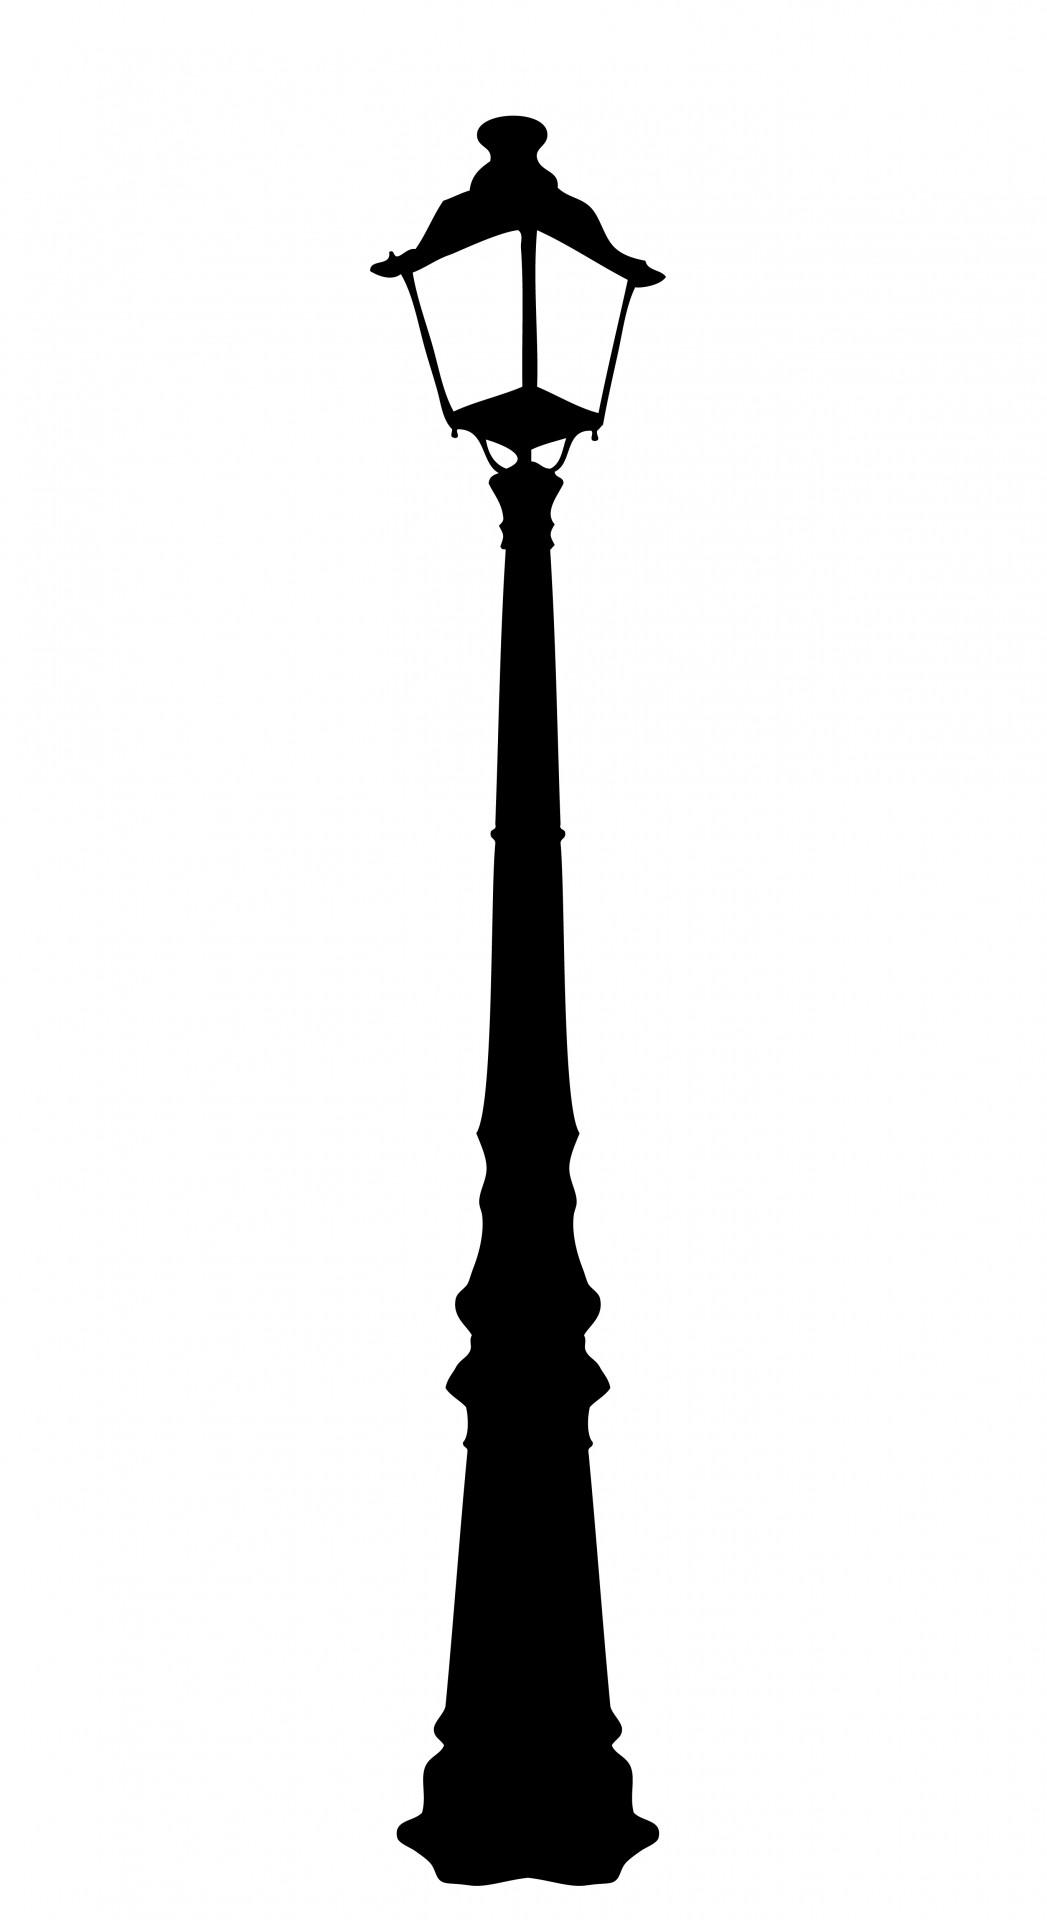 Vintage Street Lamp Clipart Free Stock Photo